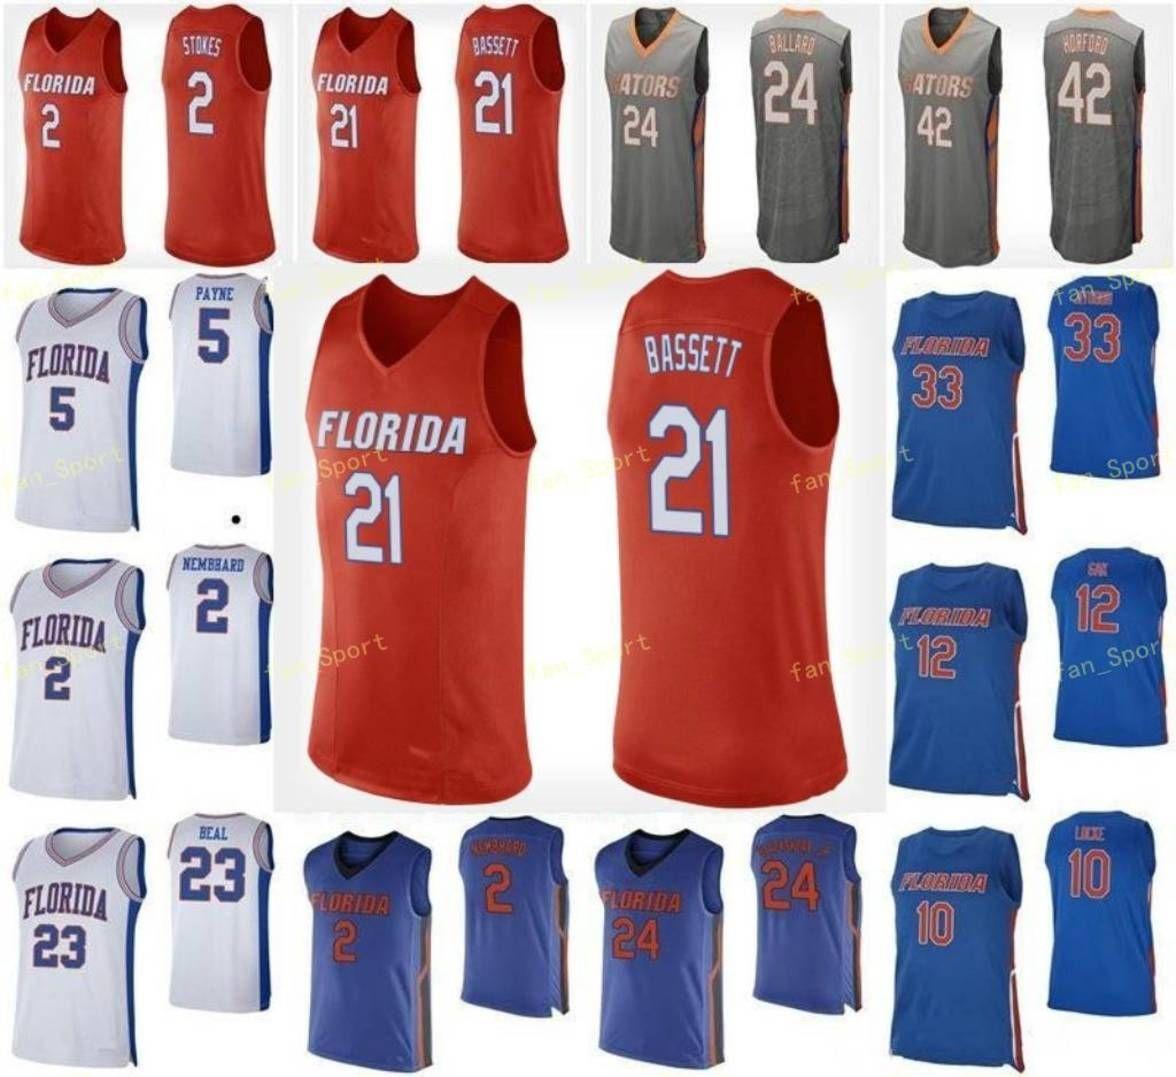 NCAA College Florida Gators كرة السلة جيرسي 2 أندرو Nembhard 21 Dontay Bassett 22 Tyree Appleby 23 Scottie Lewis مخصص مخيط